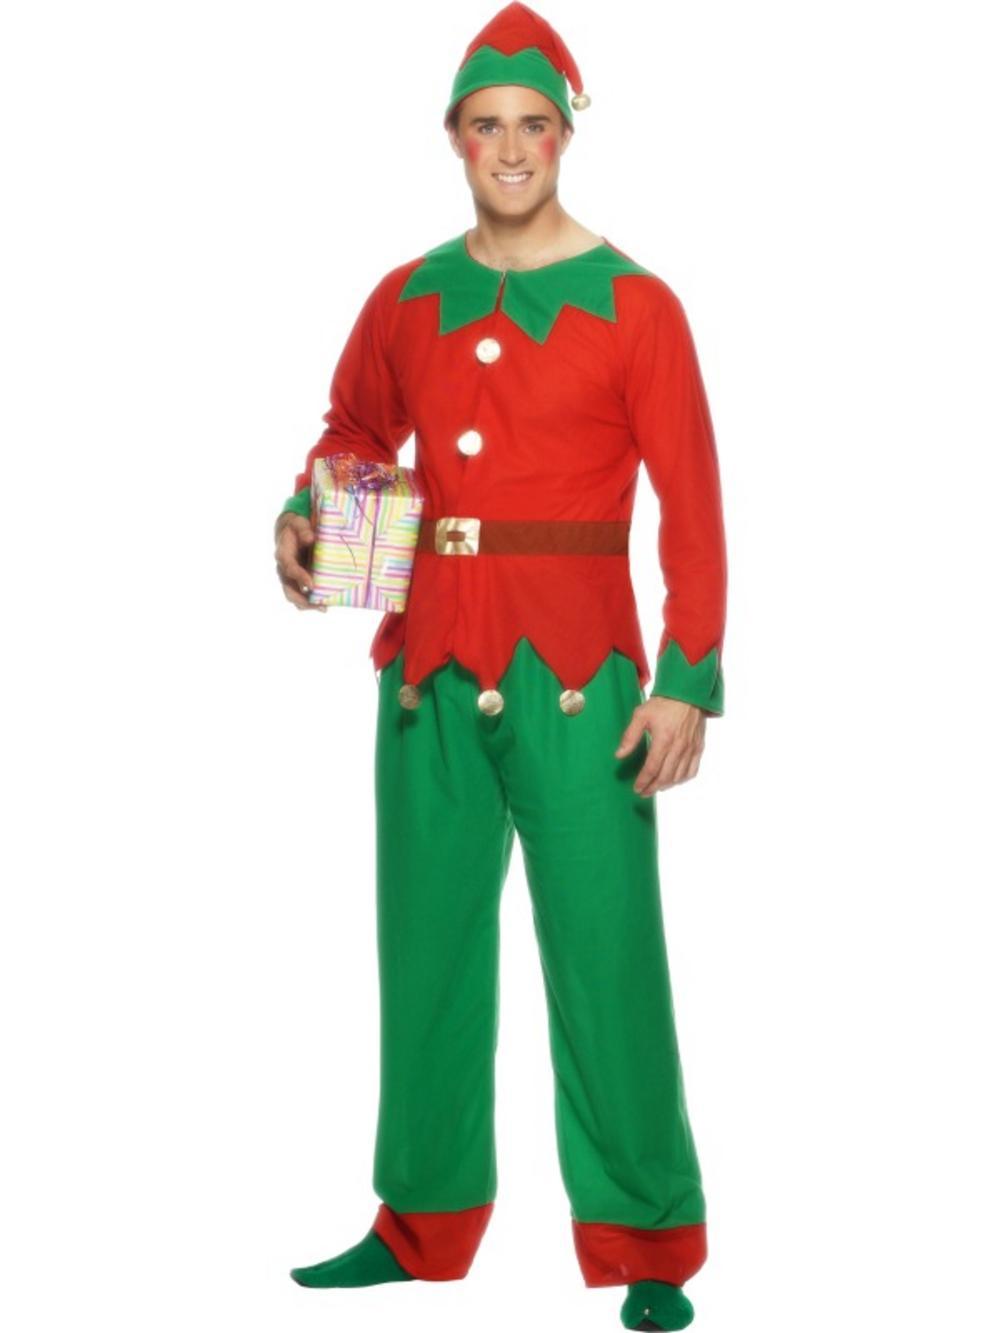 Elf Mens Costume  sc 1 st  Mega Fancy Dress & Elf Mens Costume | Mens Christmas Costumes | Mega Fancy Dress